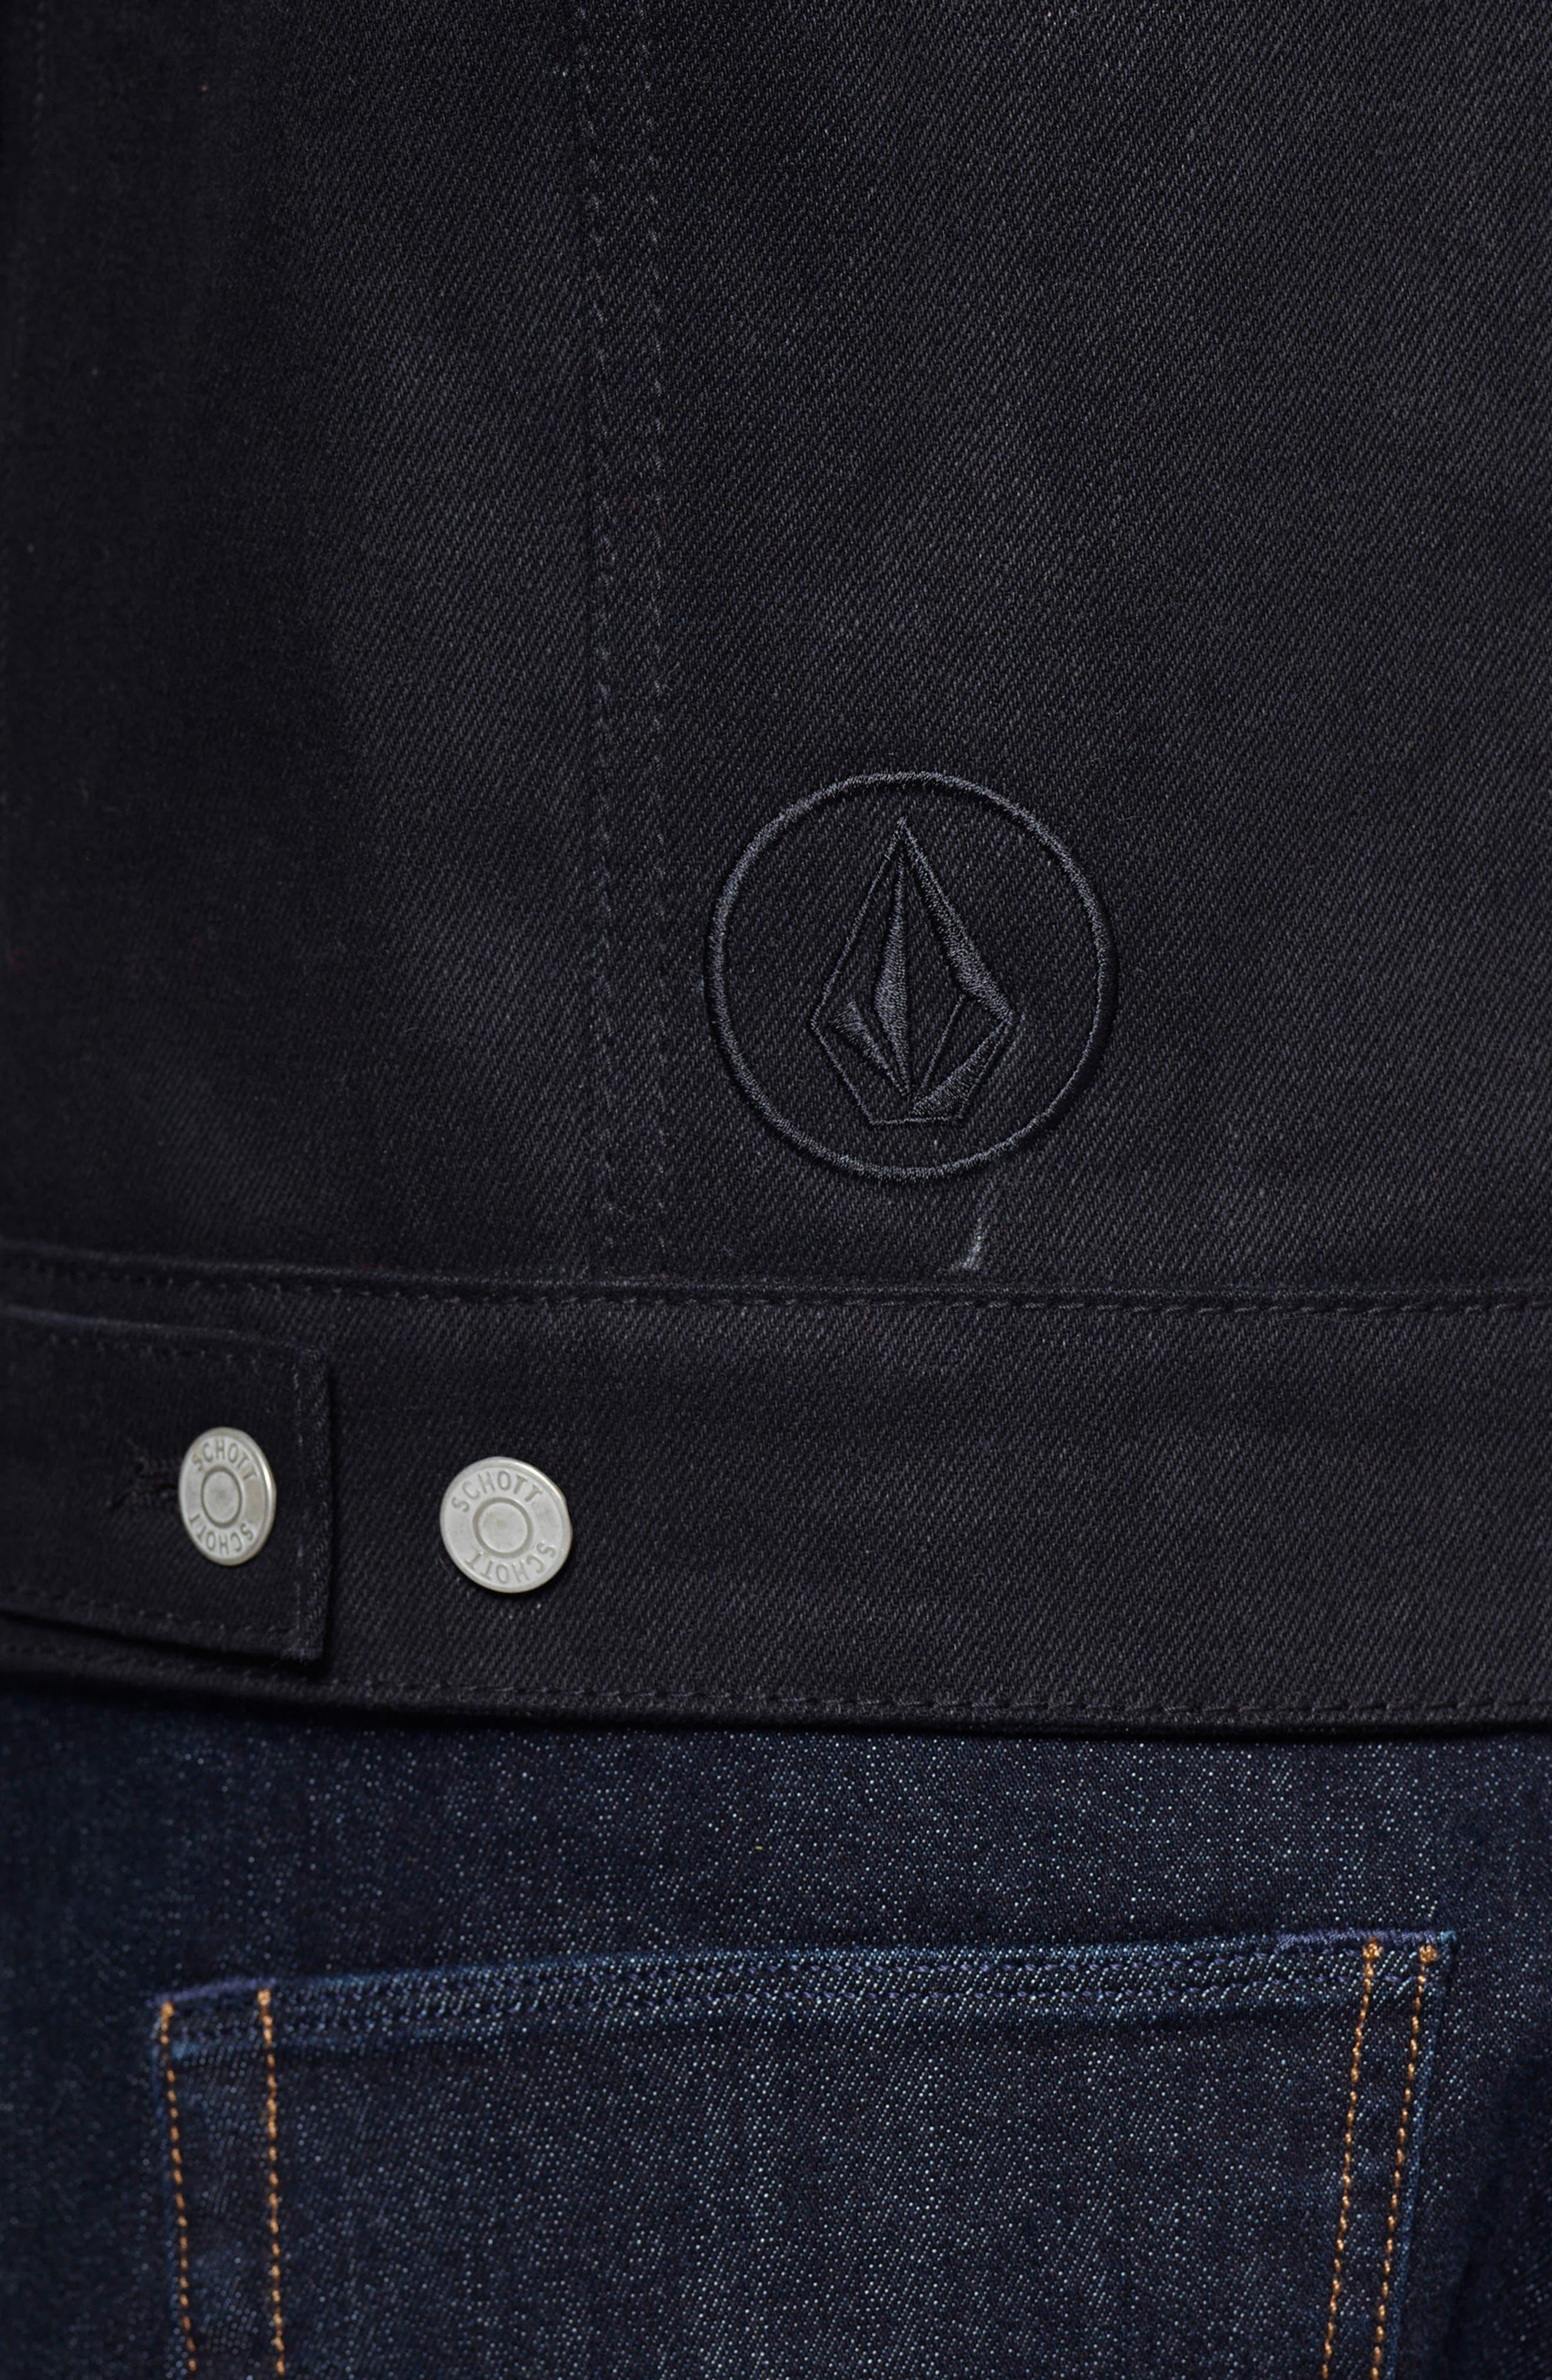 x Schott Denim Jacket,                             Alternate thumbnail 4, color,                             Black